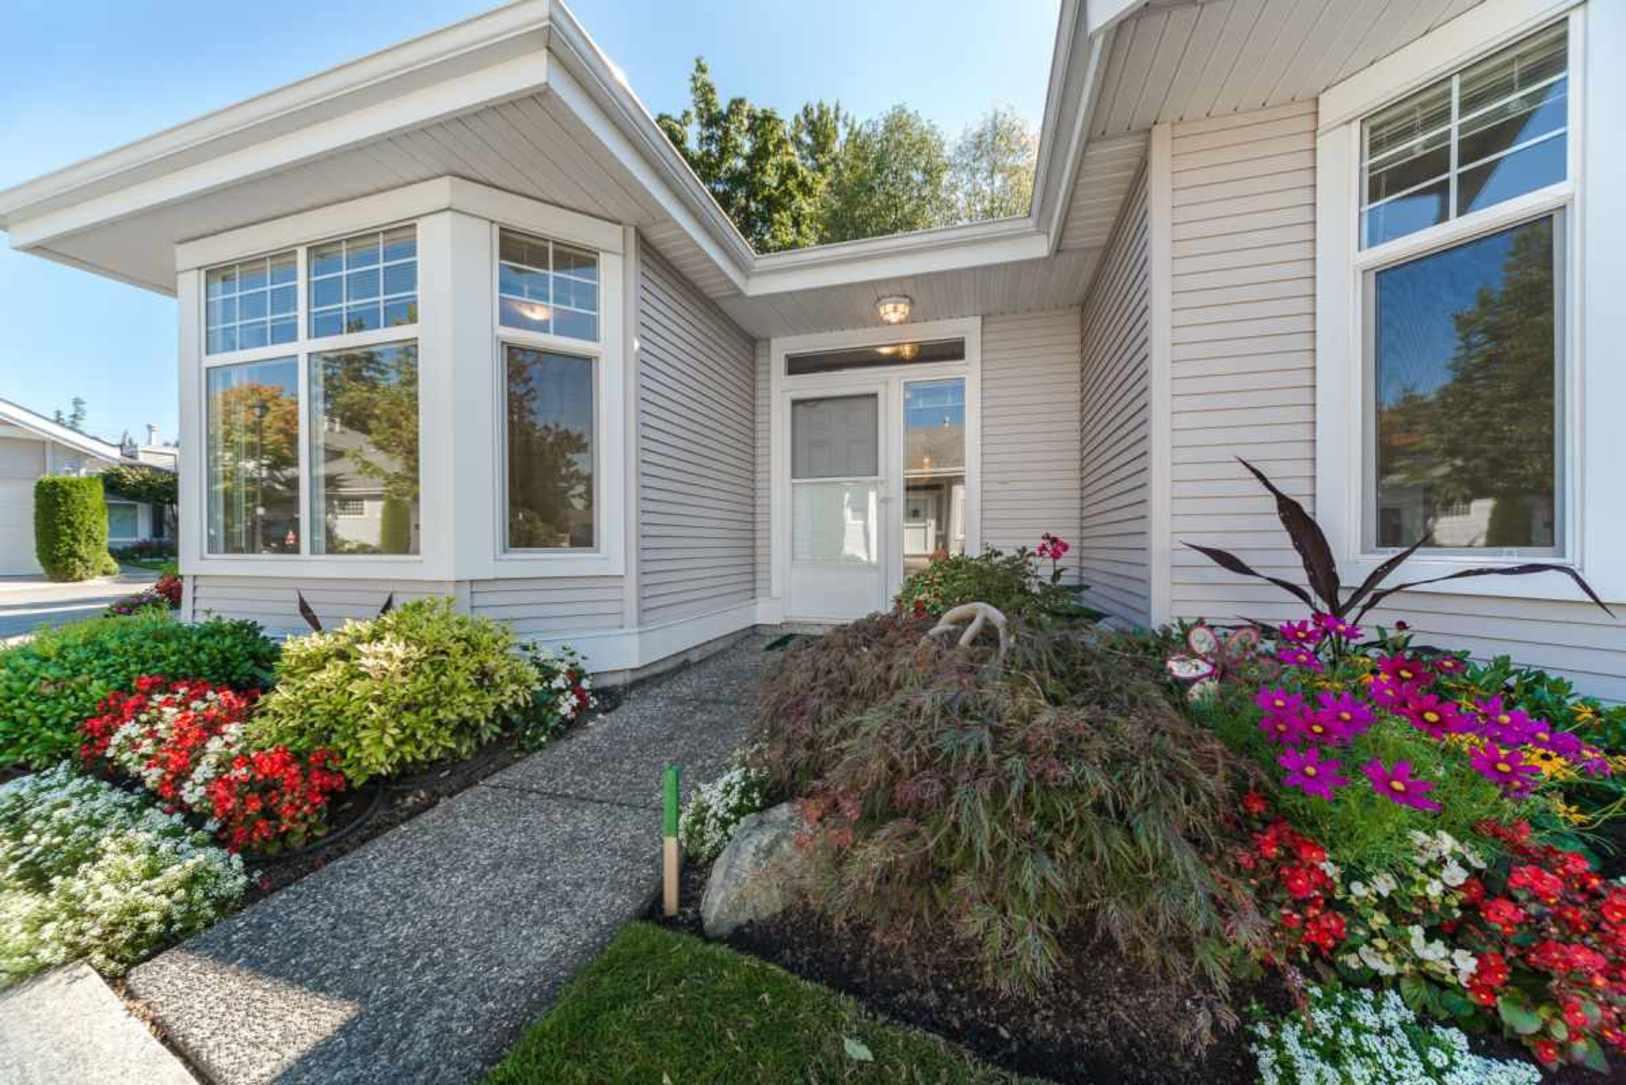 Entrance at 19 - 20770 97b Avenue, Walnut Grove, Langley